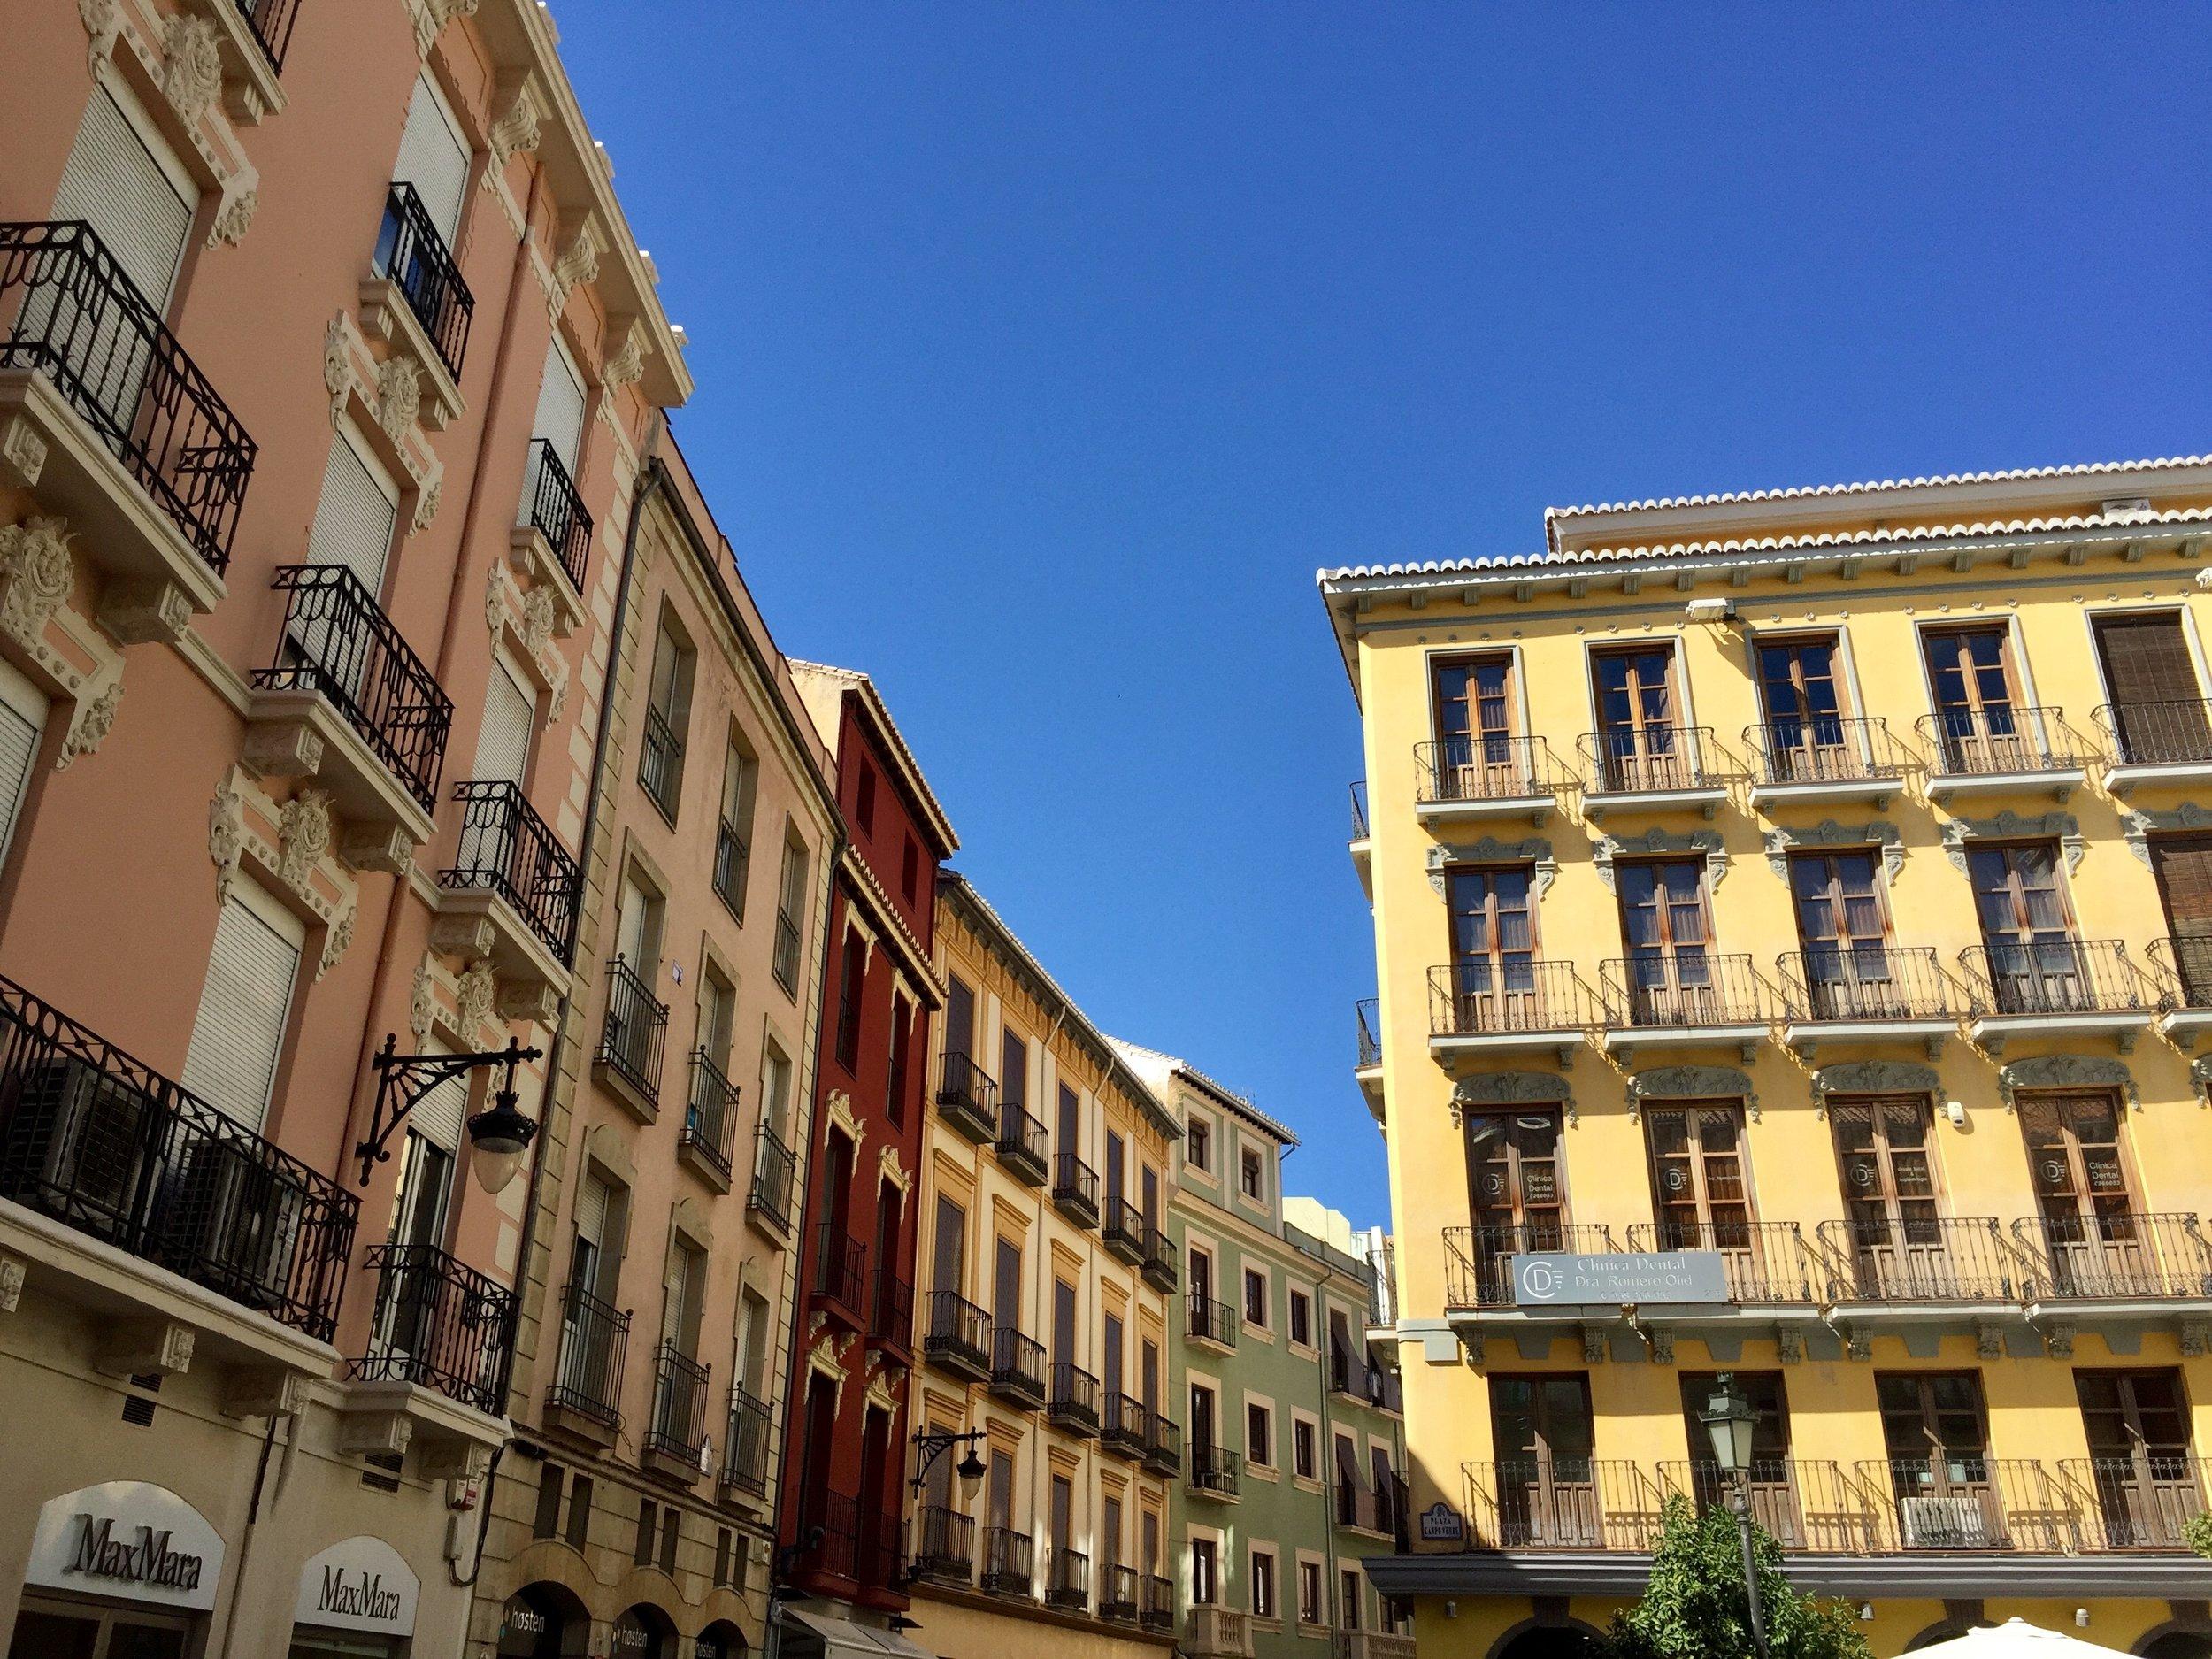 Granada Spain Cityscape.jpg